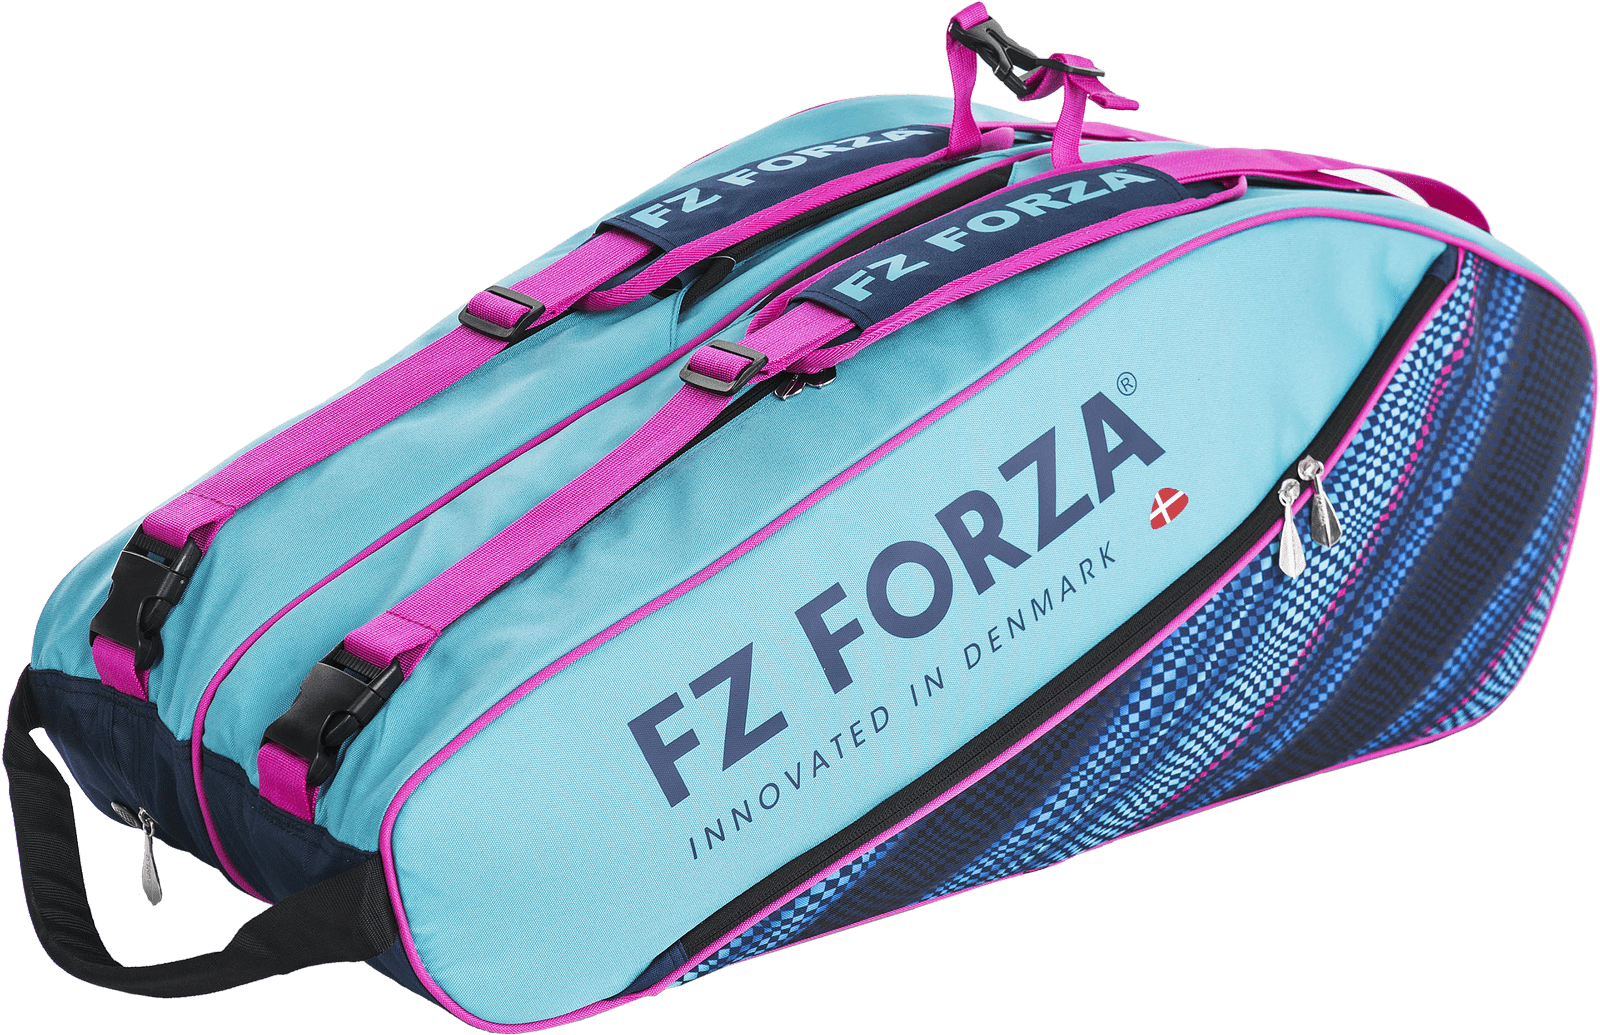 Forza Linada Racket Bag